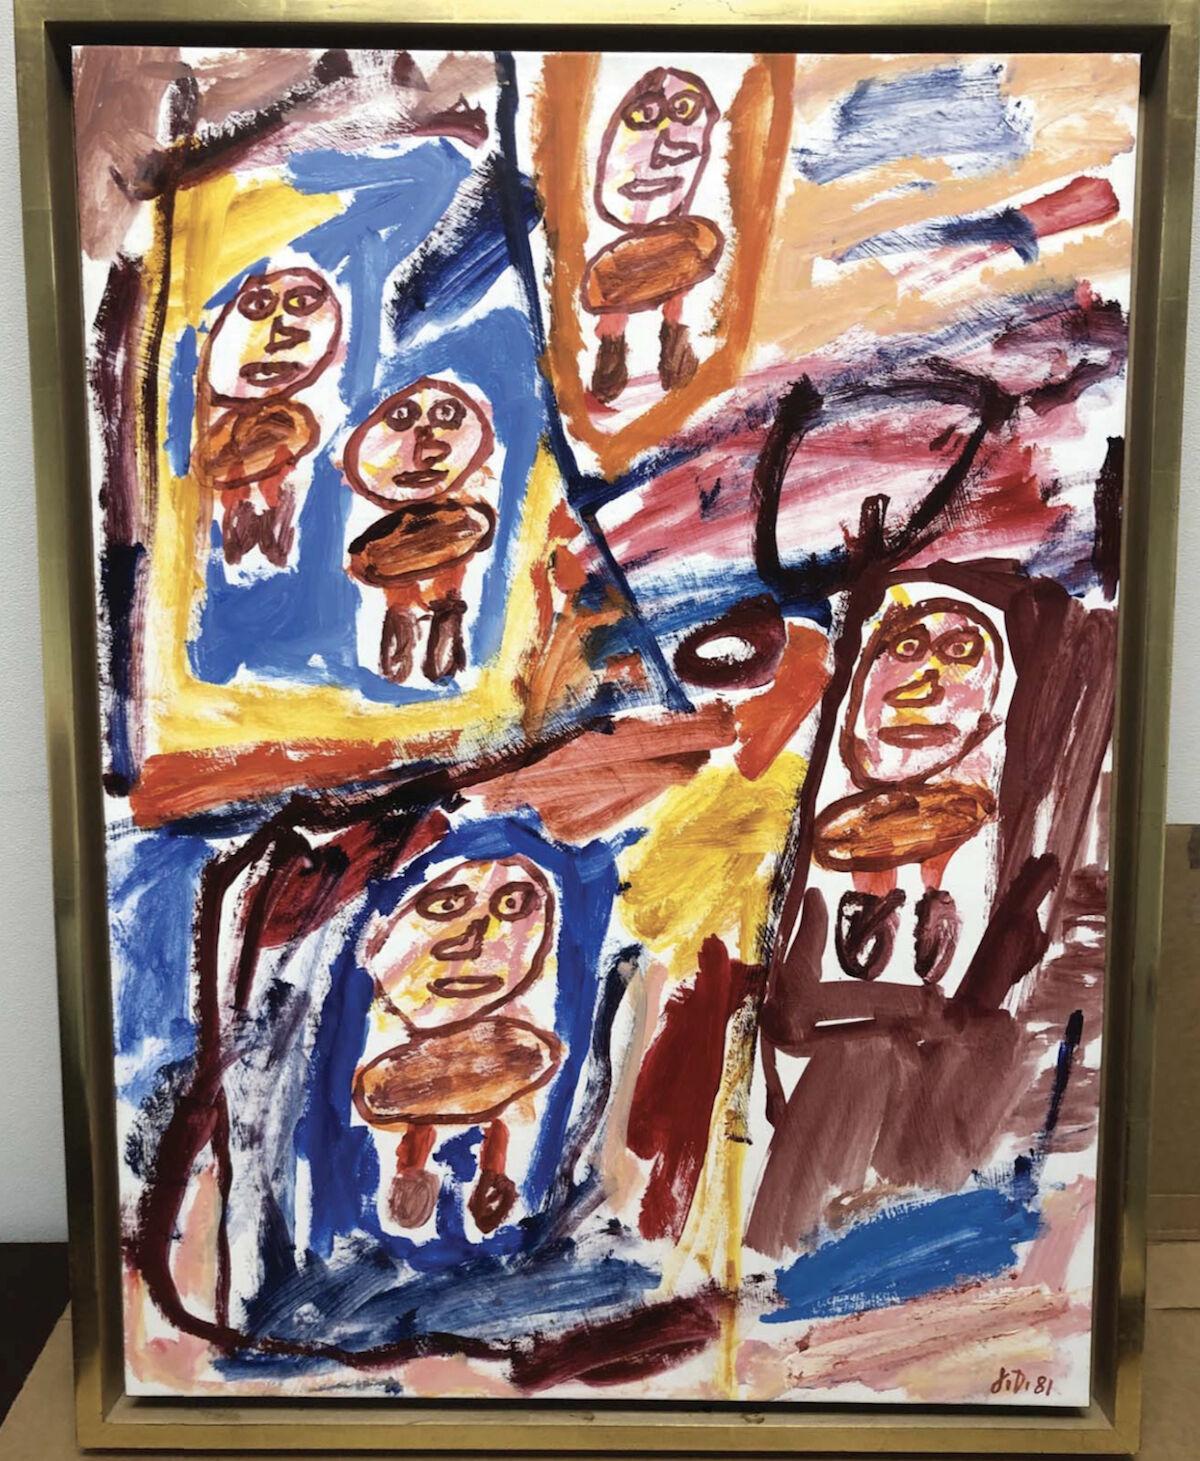 Jean Dubuffet,  Site avec 5 personnages , 1981. Via U.S. Department of Justice.